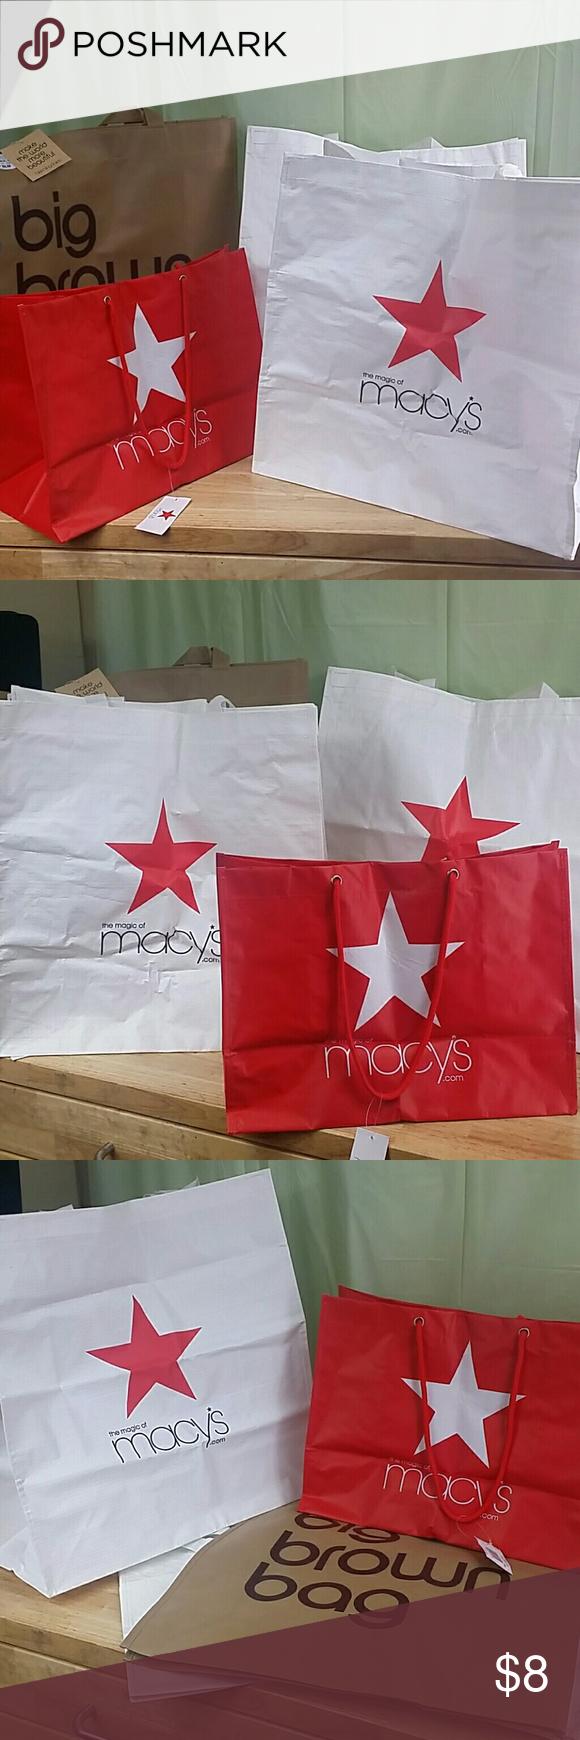 macy s reusable shopping bags big brown bag nwt my posh closet